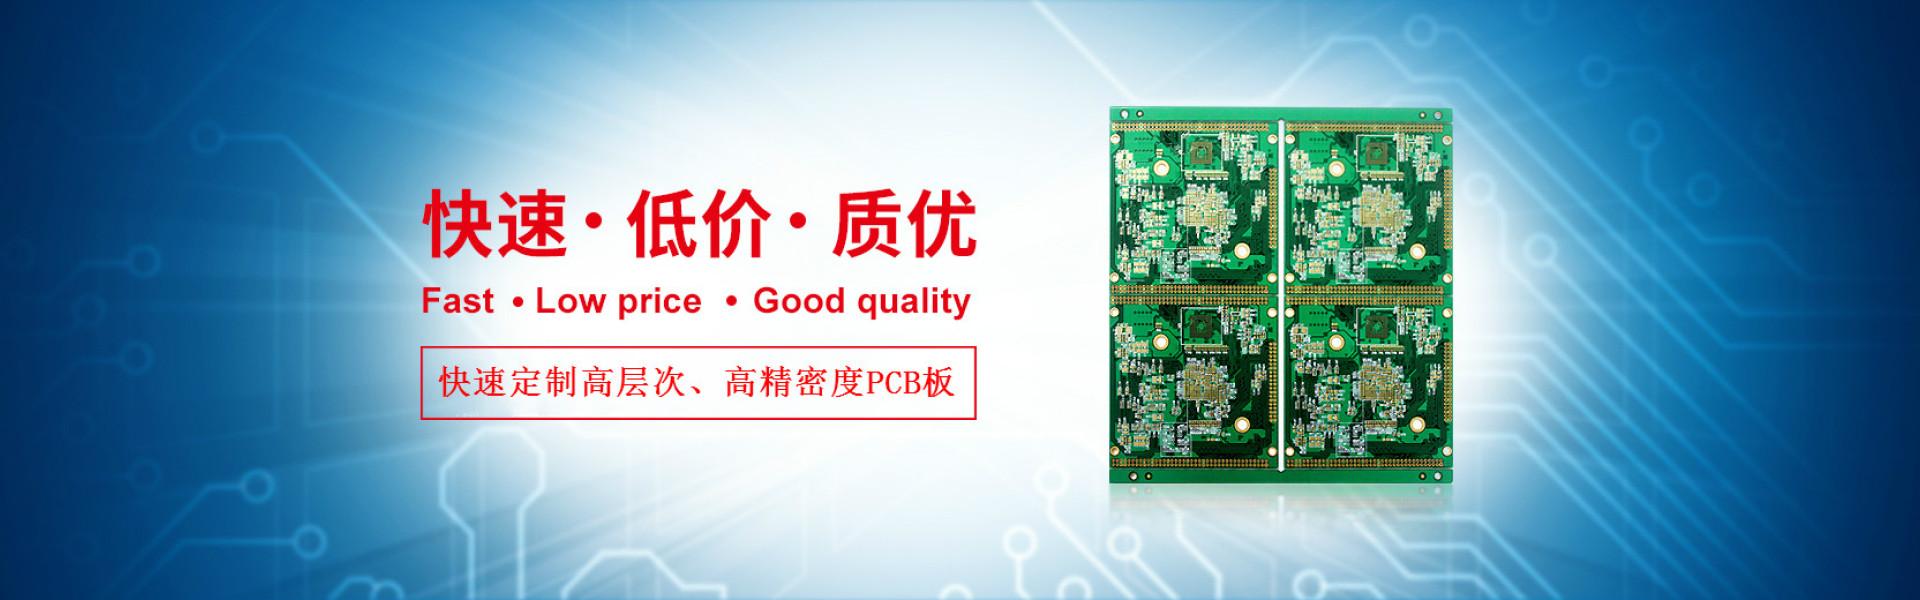 pcb厂家-高精密度pcb板